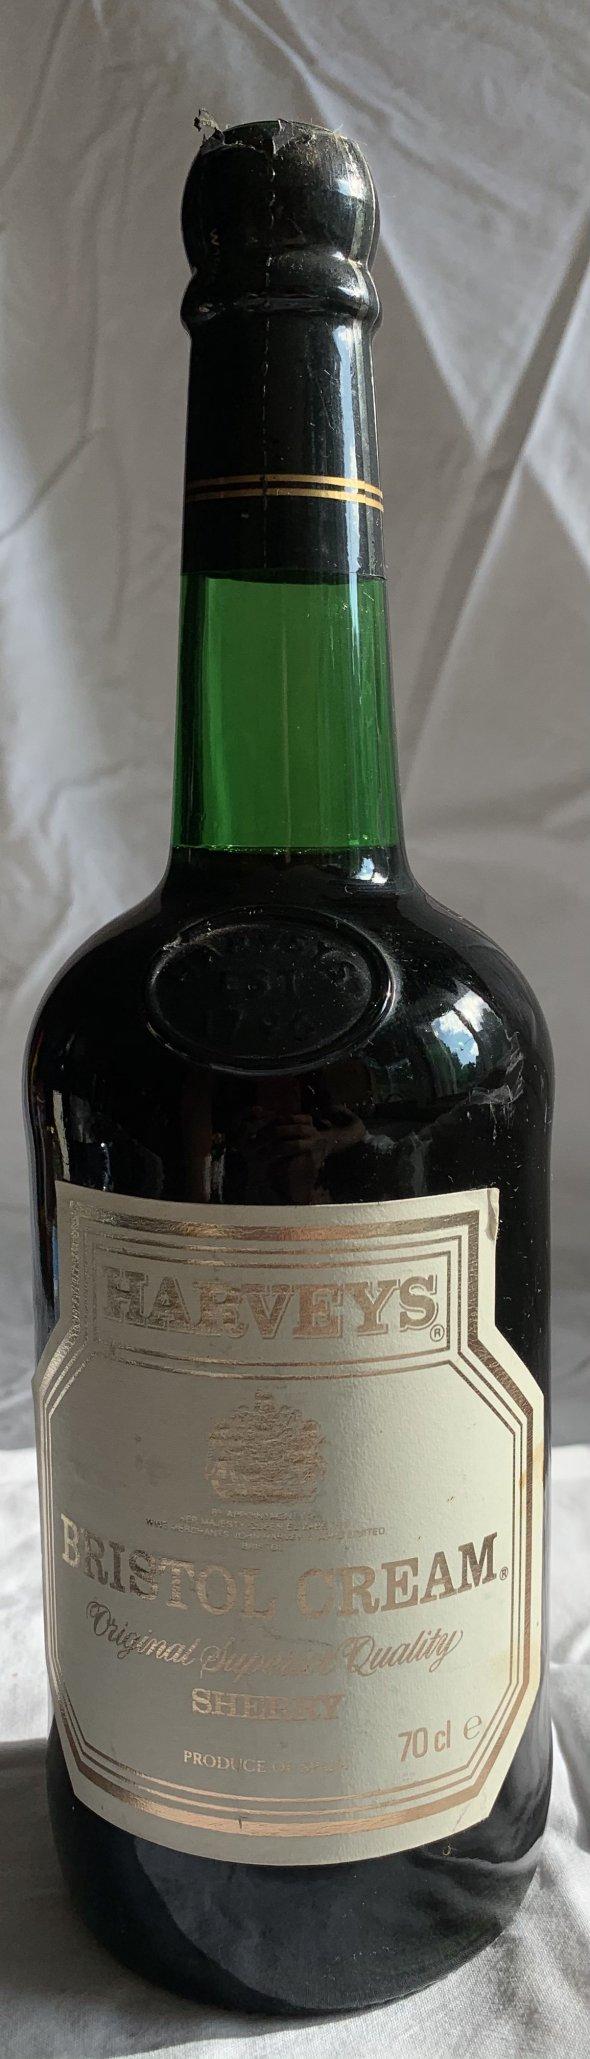 Graham's, Late Bottled Vintage Port